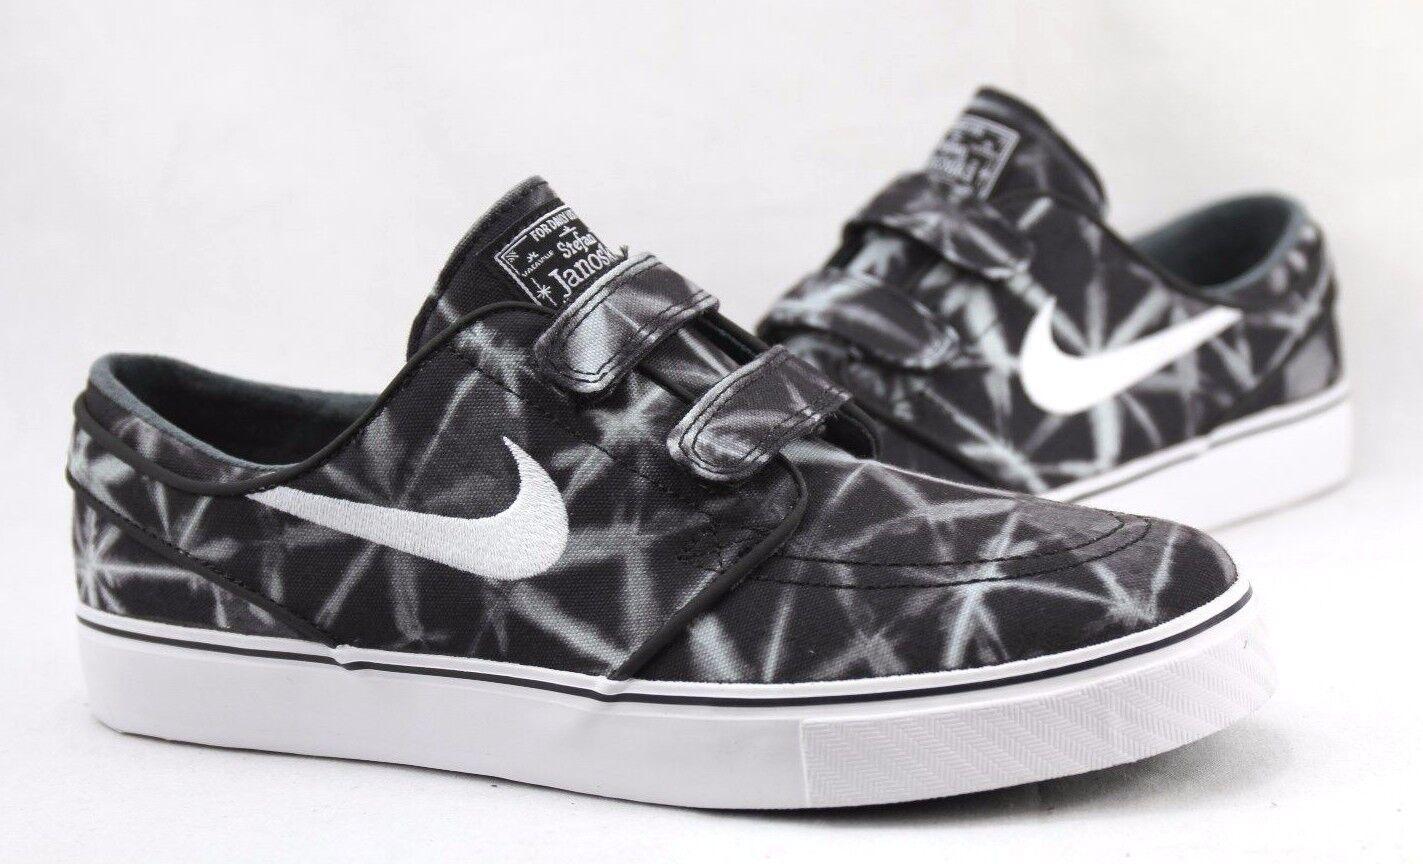 Nike Men's Shoes SB Zoom Stefan Janoski AC Casual Shoes Size 8~10.5